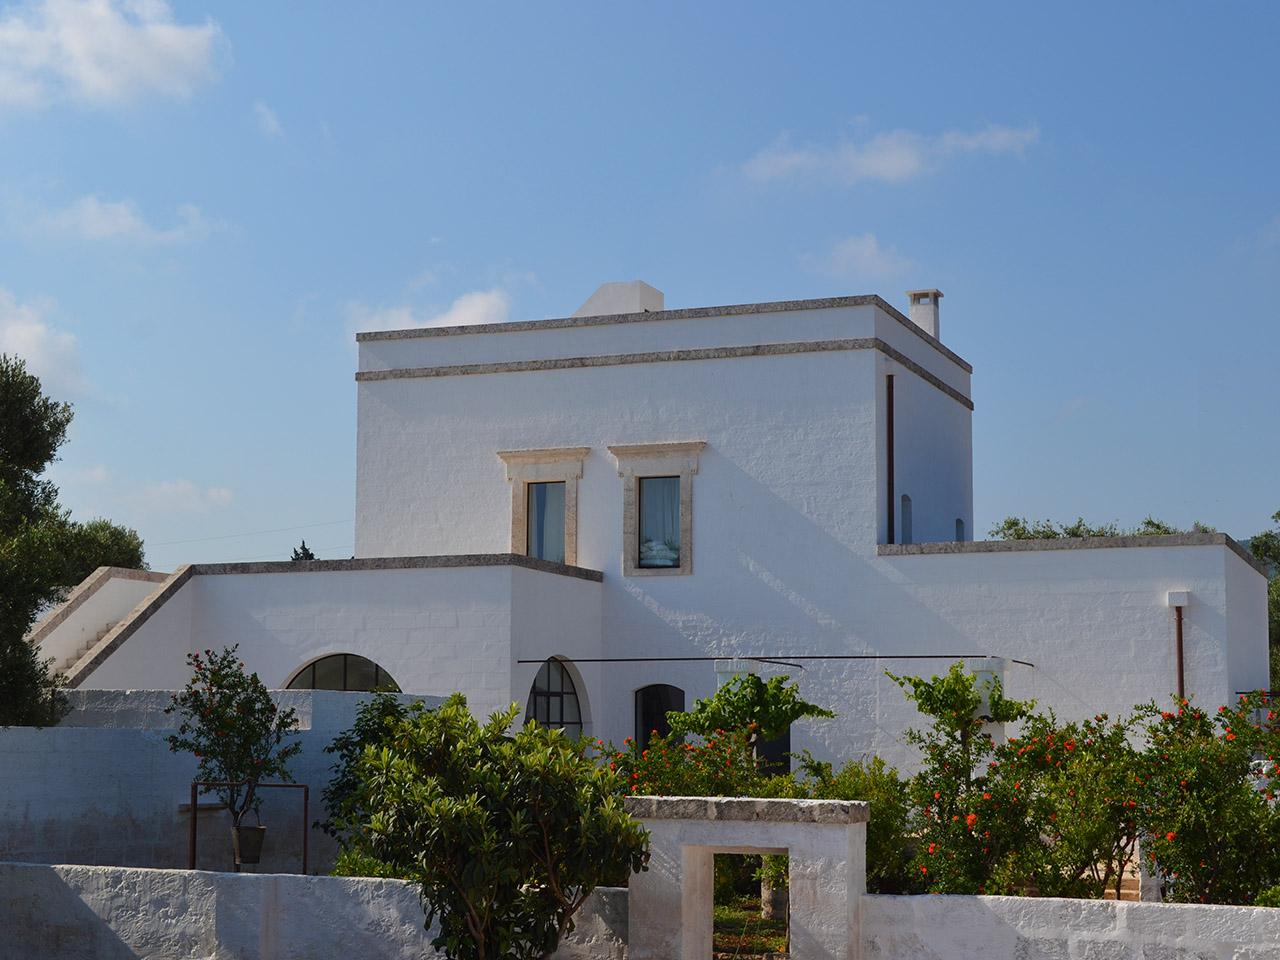 costruzioni restauri sirio ostuni restauro ristrutturazione masseria olive nardo ostuni dsc 5125